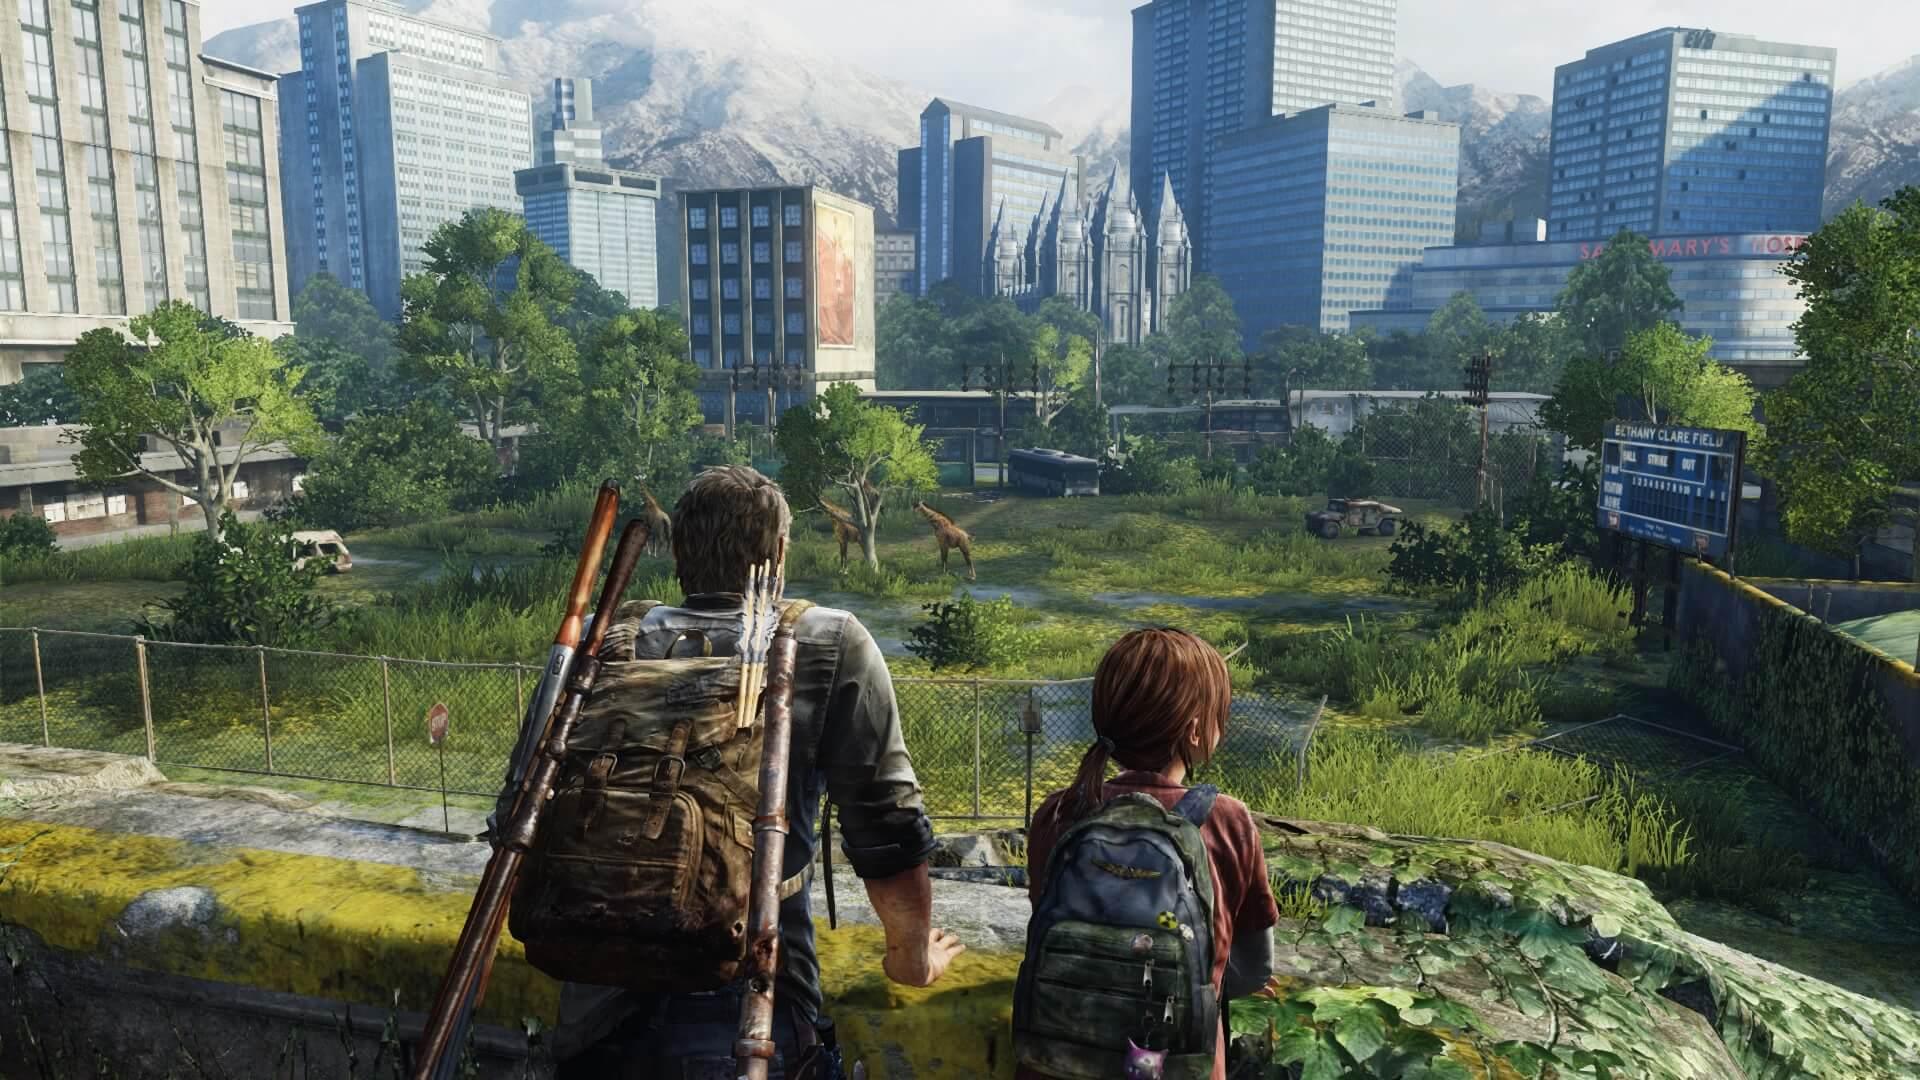 210 The Last Of Us Papéis De Parede Hd: The Last Of Us Remastered (PS4)